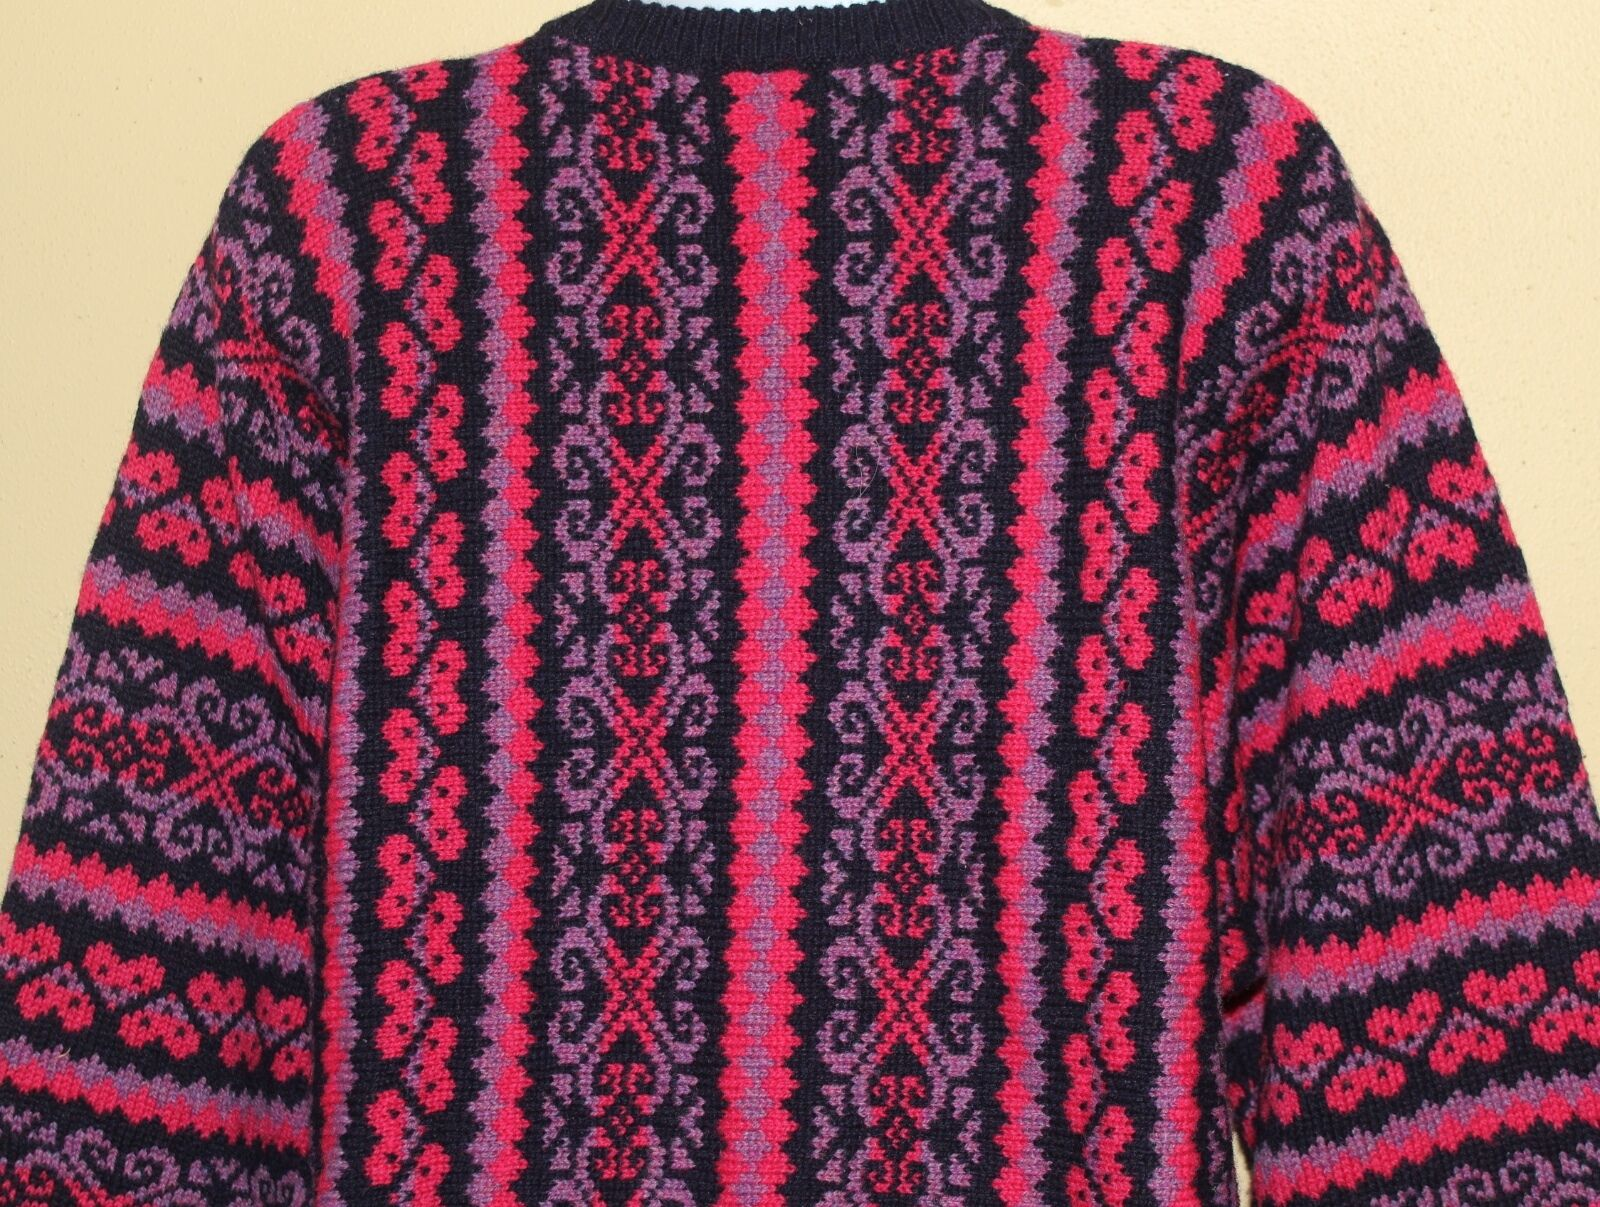 Jennie Ross Fiber Artist Scotland Scotland Scotland Folk Nordic Fantasy Wool Knit Sweater Sz M c6d56d